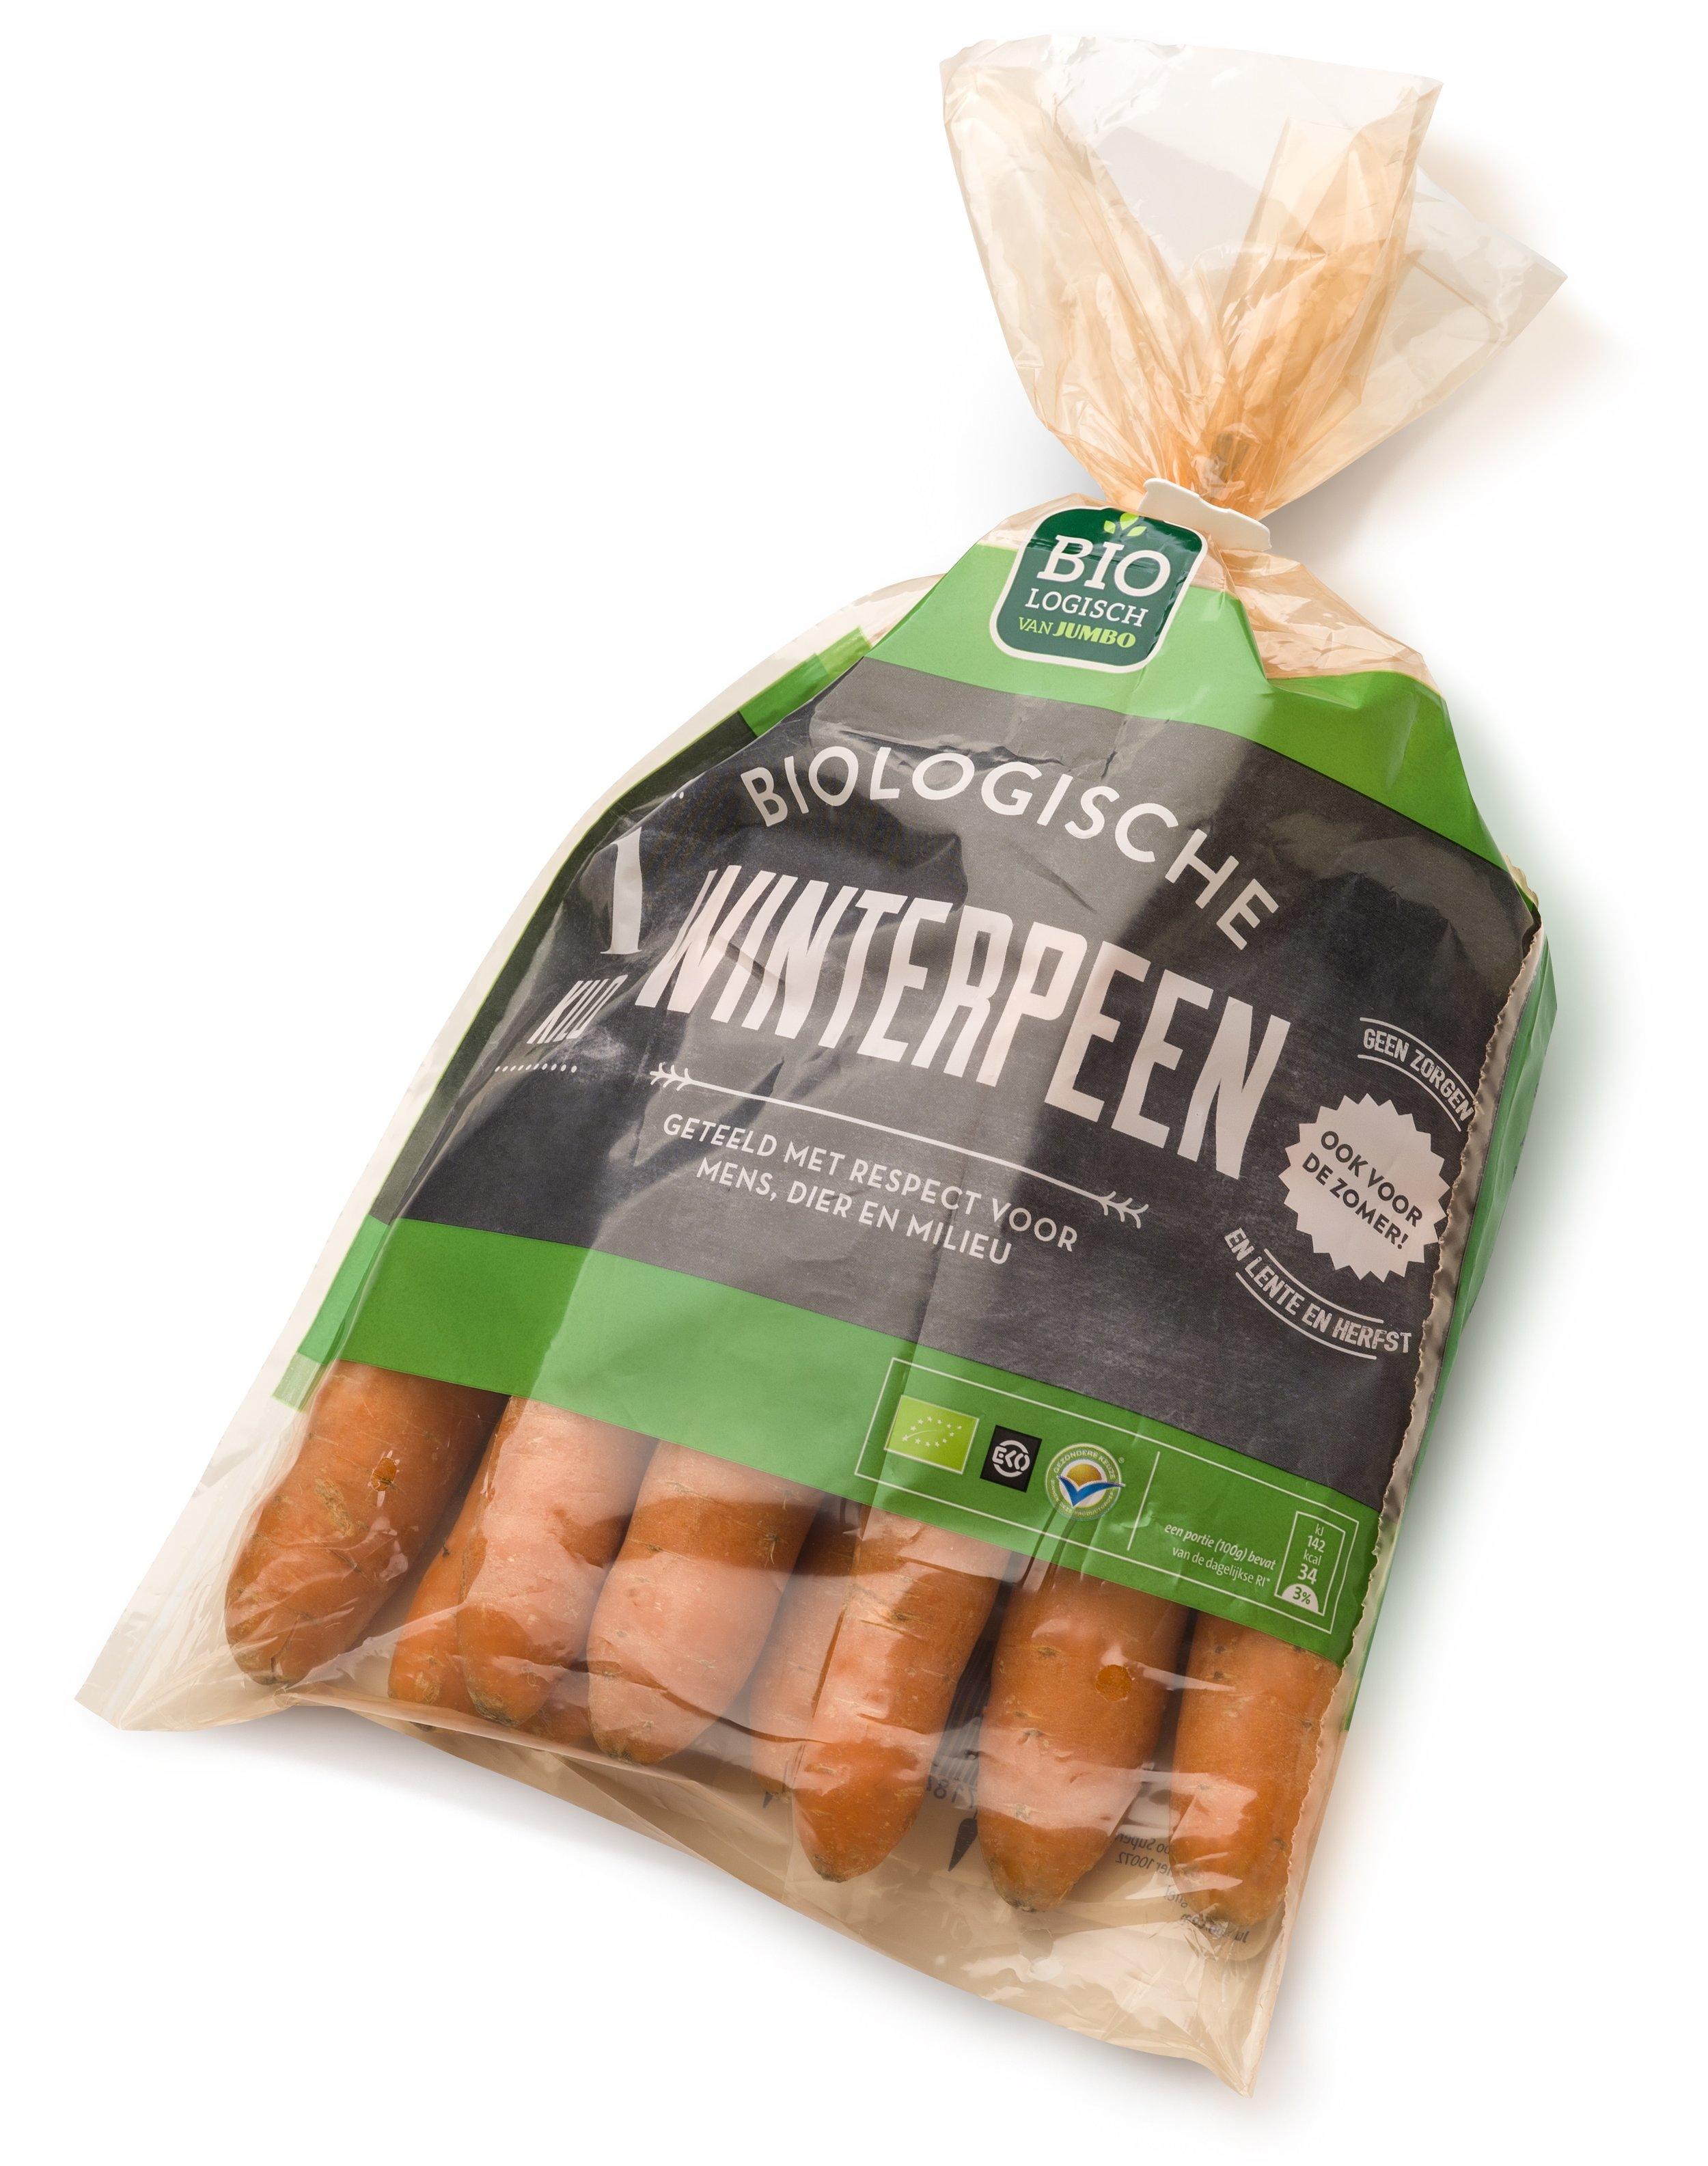 Produce - Carrots.jpg